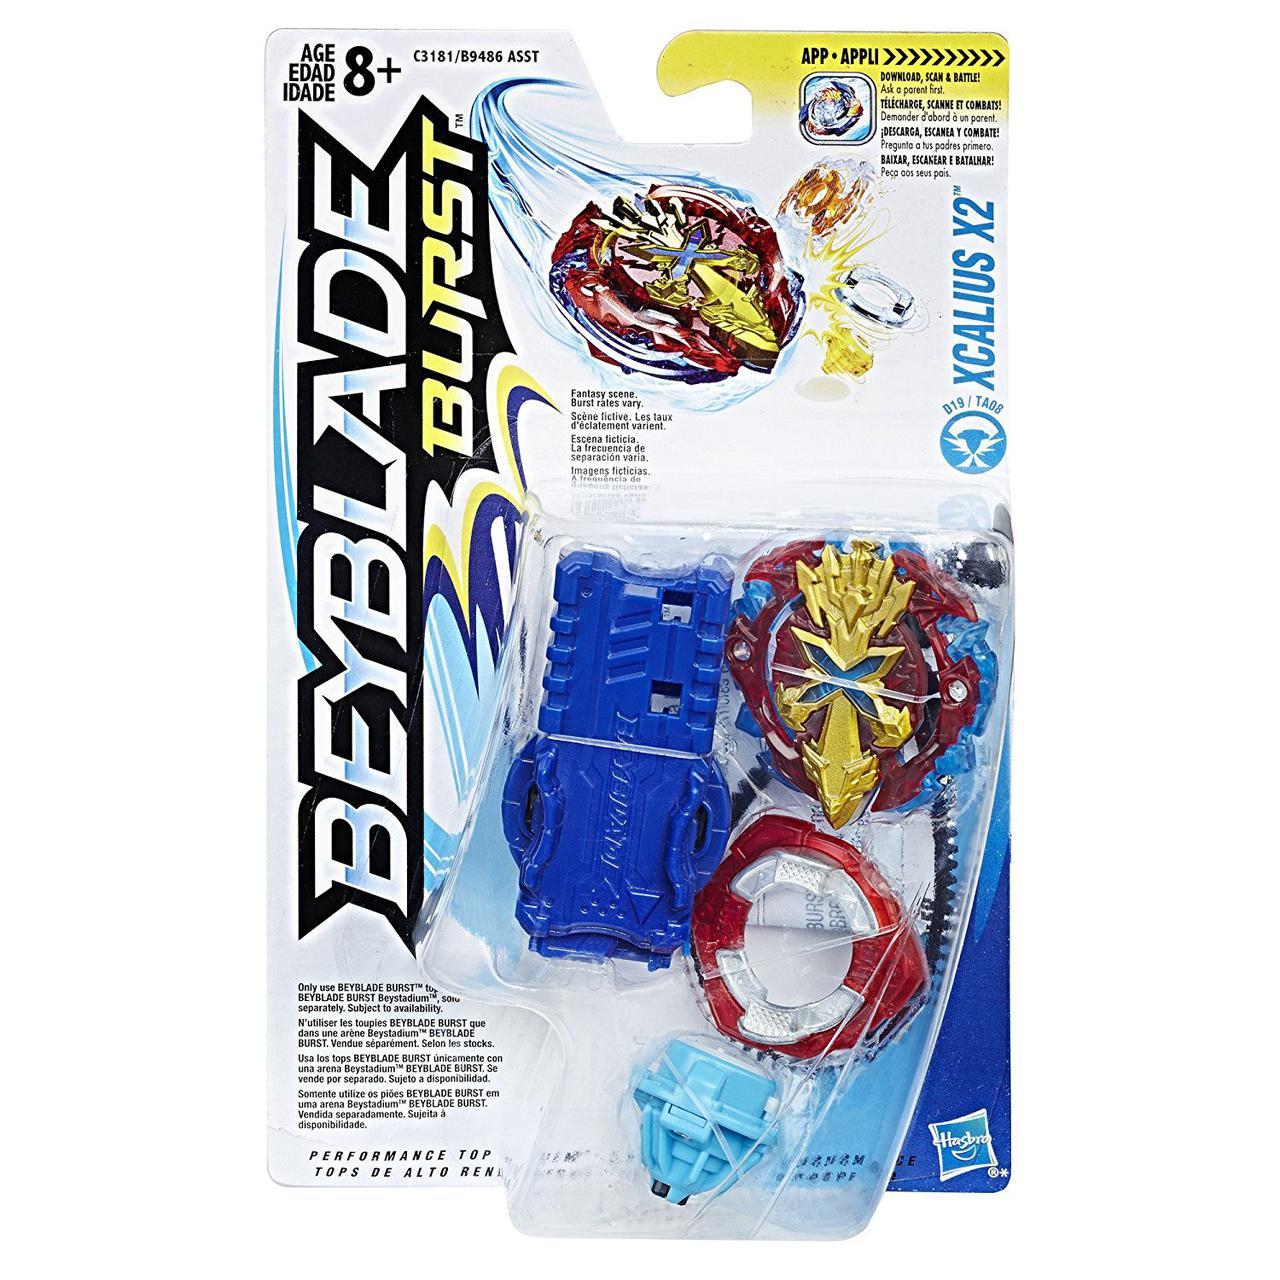 Бейблейд оригинал Hasbro c пусковым устройством Xcalius X2 Эксалиус Х2